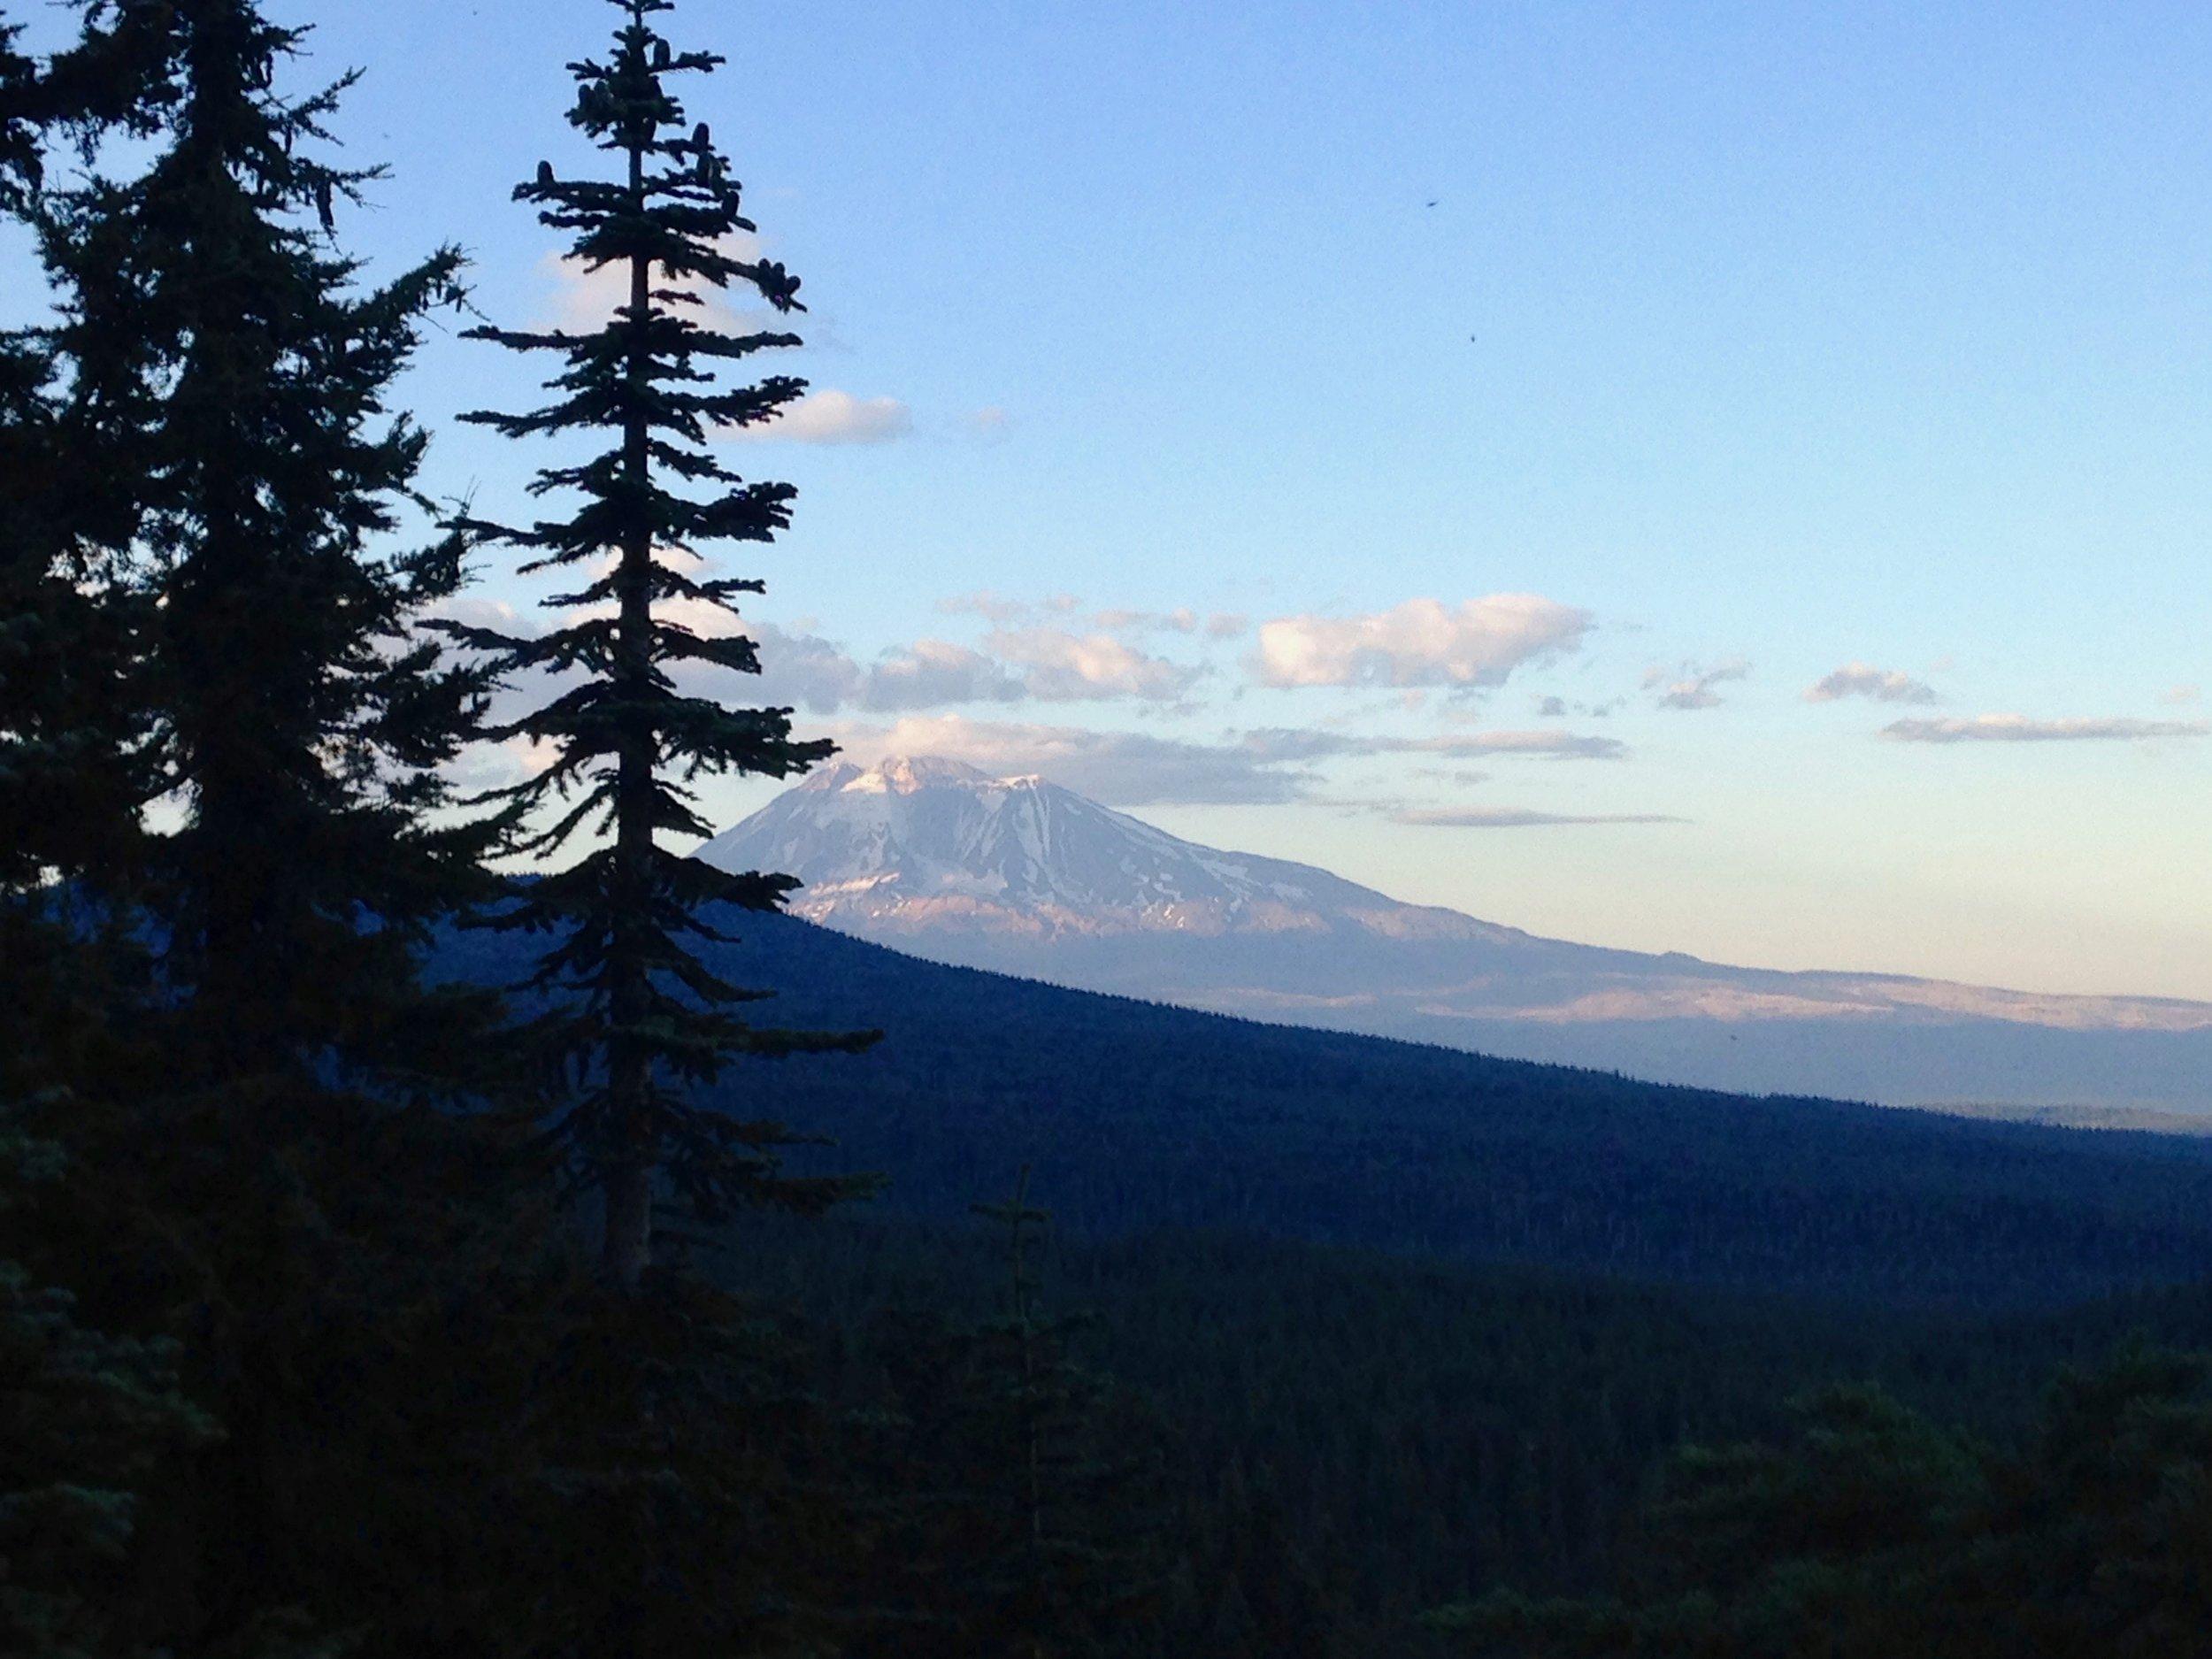 Mount Adams - Gifford Pinchot National Forest, WA